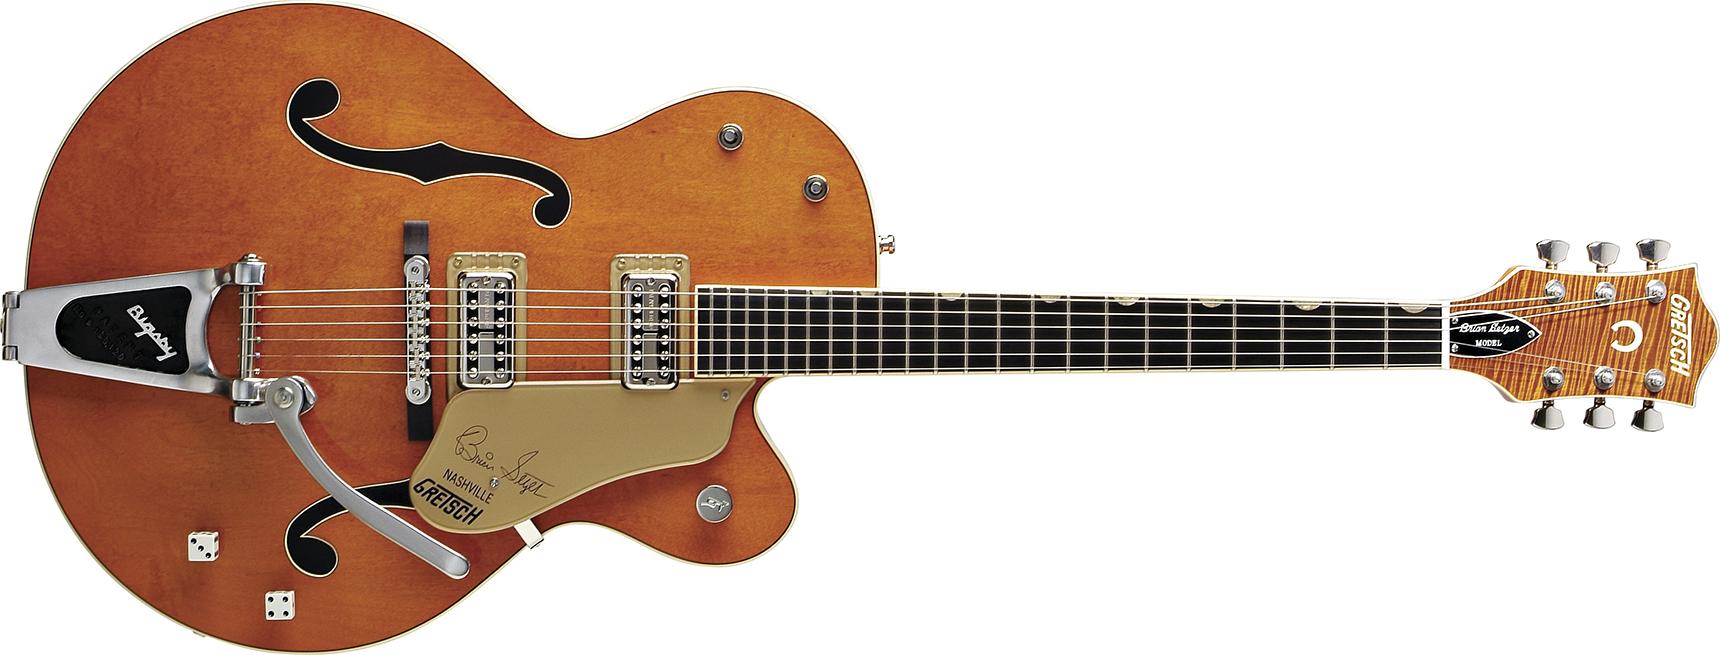 guitars品牌_电吉他